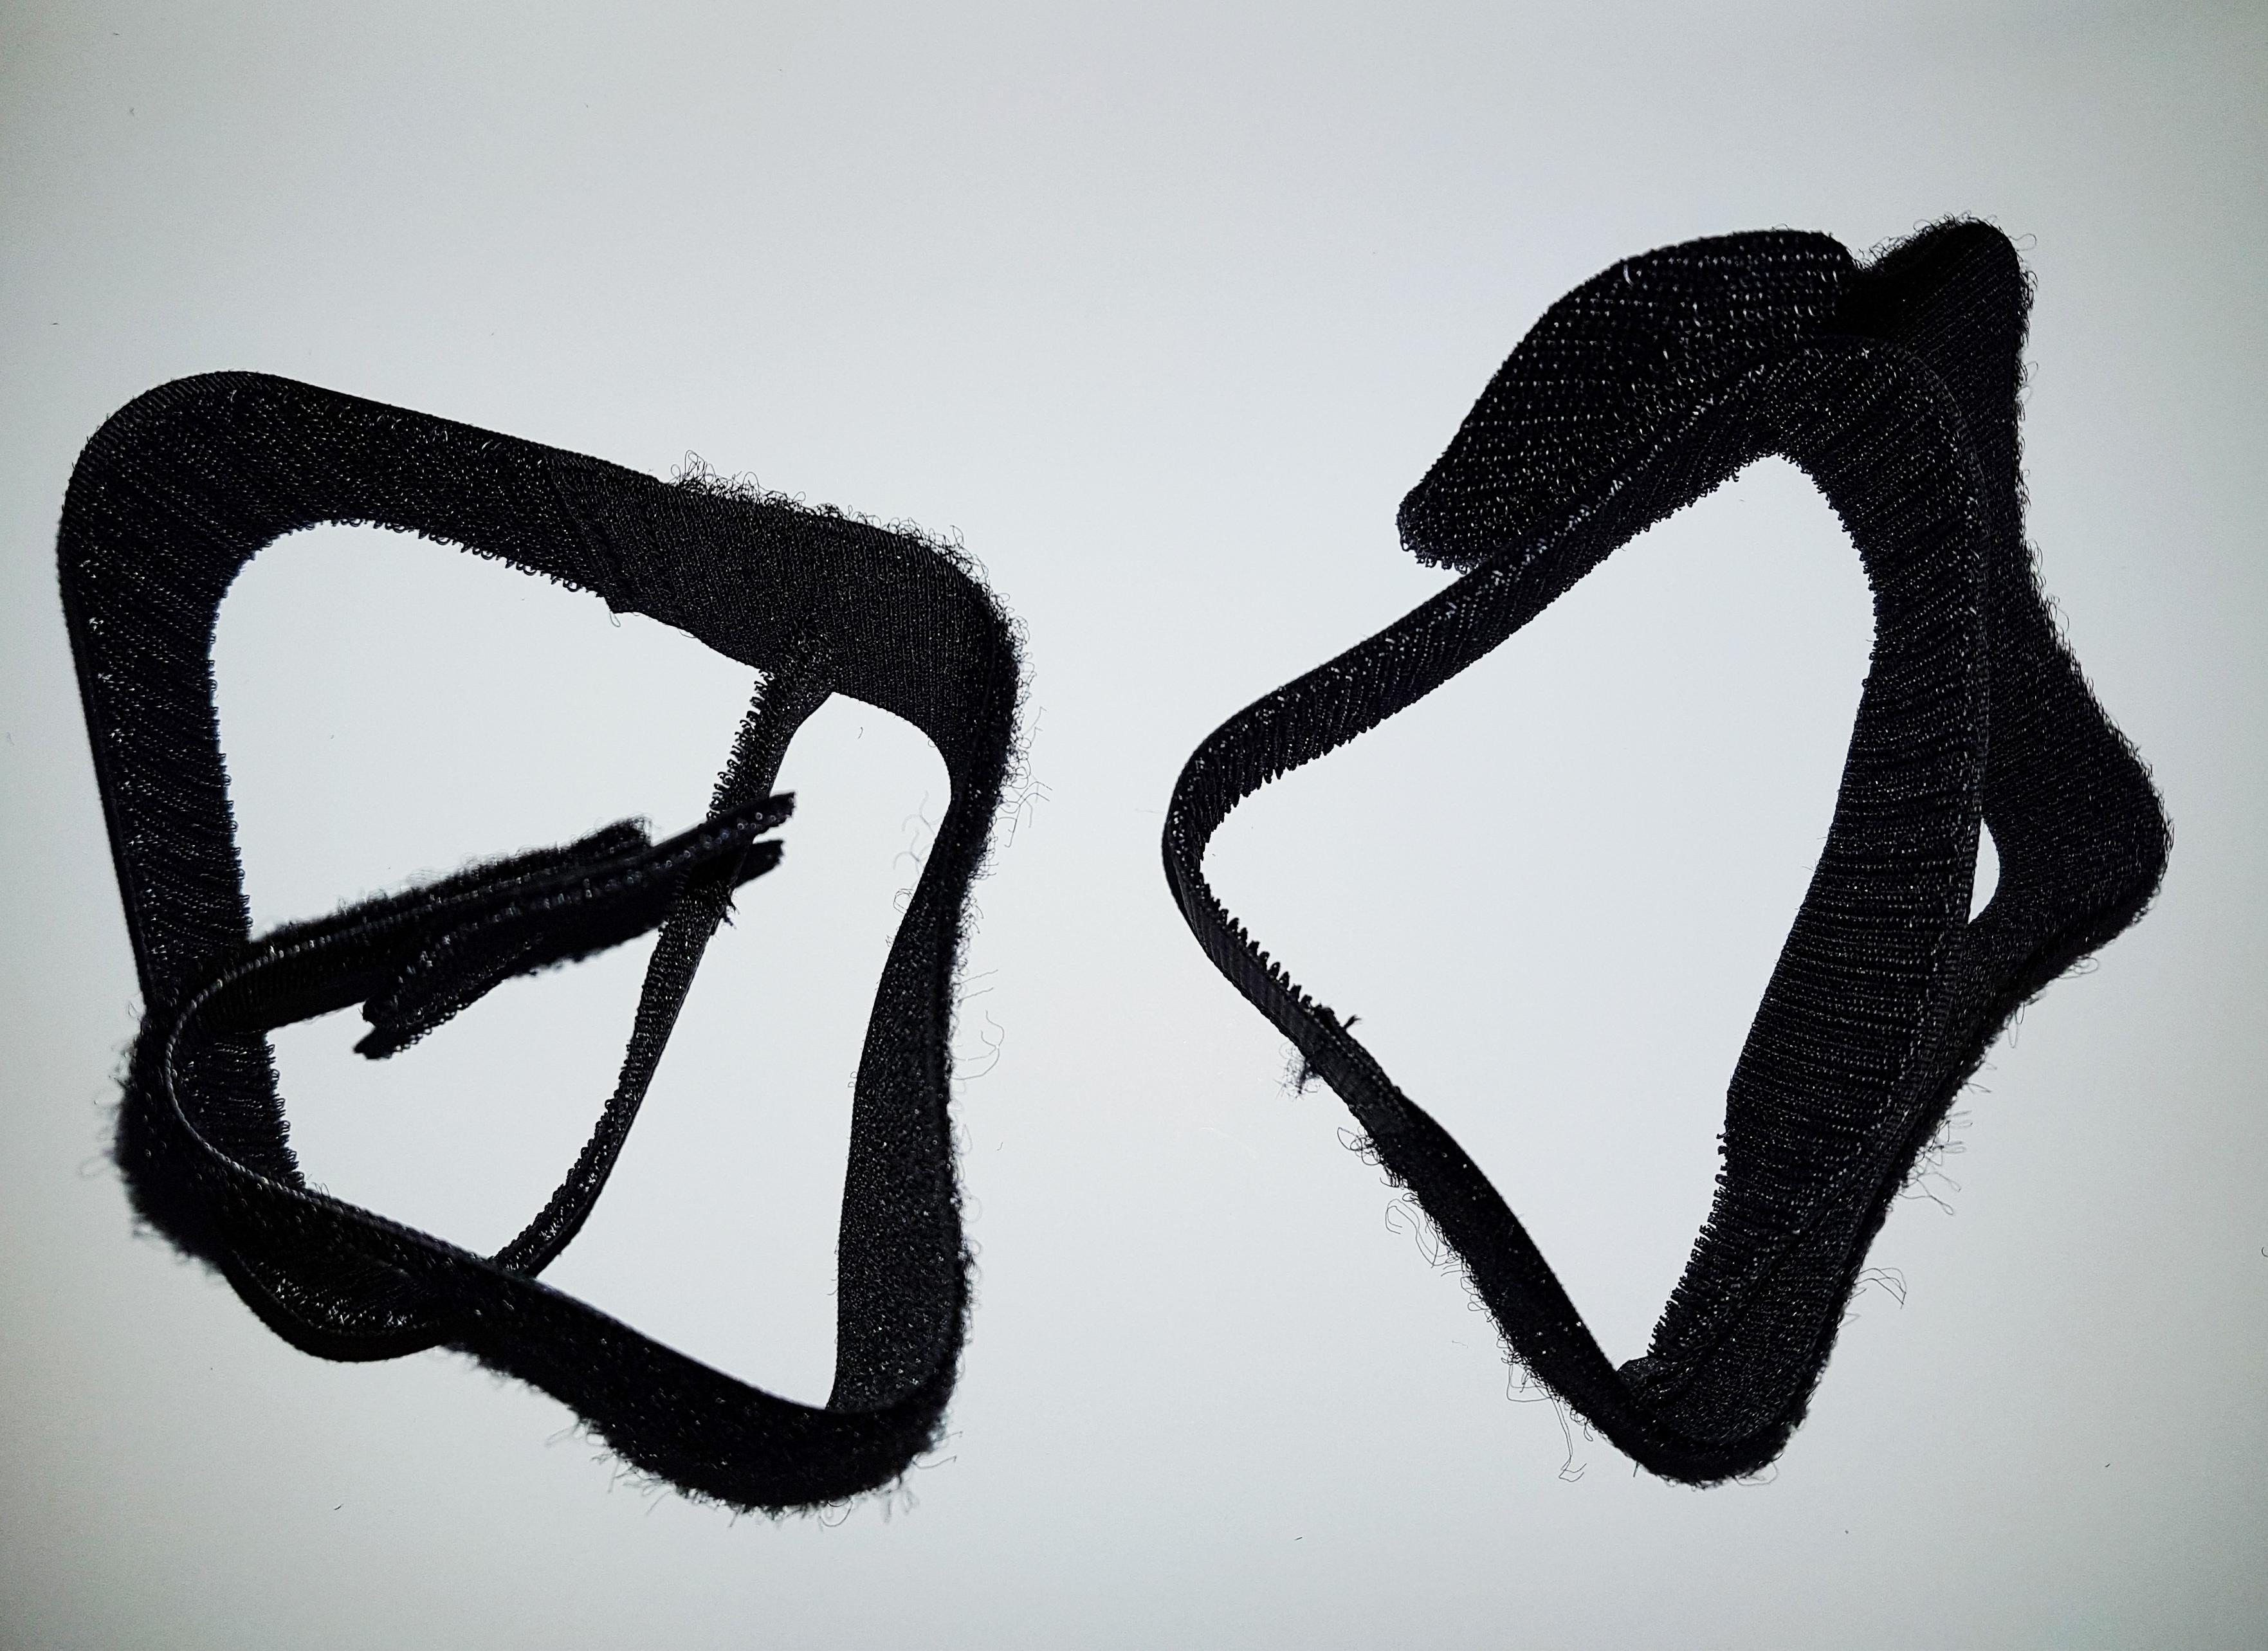 ION Beinkletts für Neoprenanzüge - Klett Kletts Velcro Leg Loops for Wetsuits